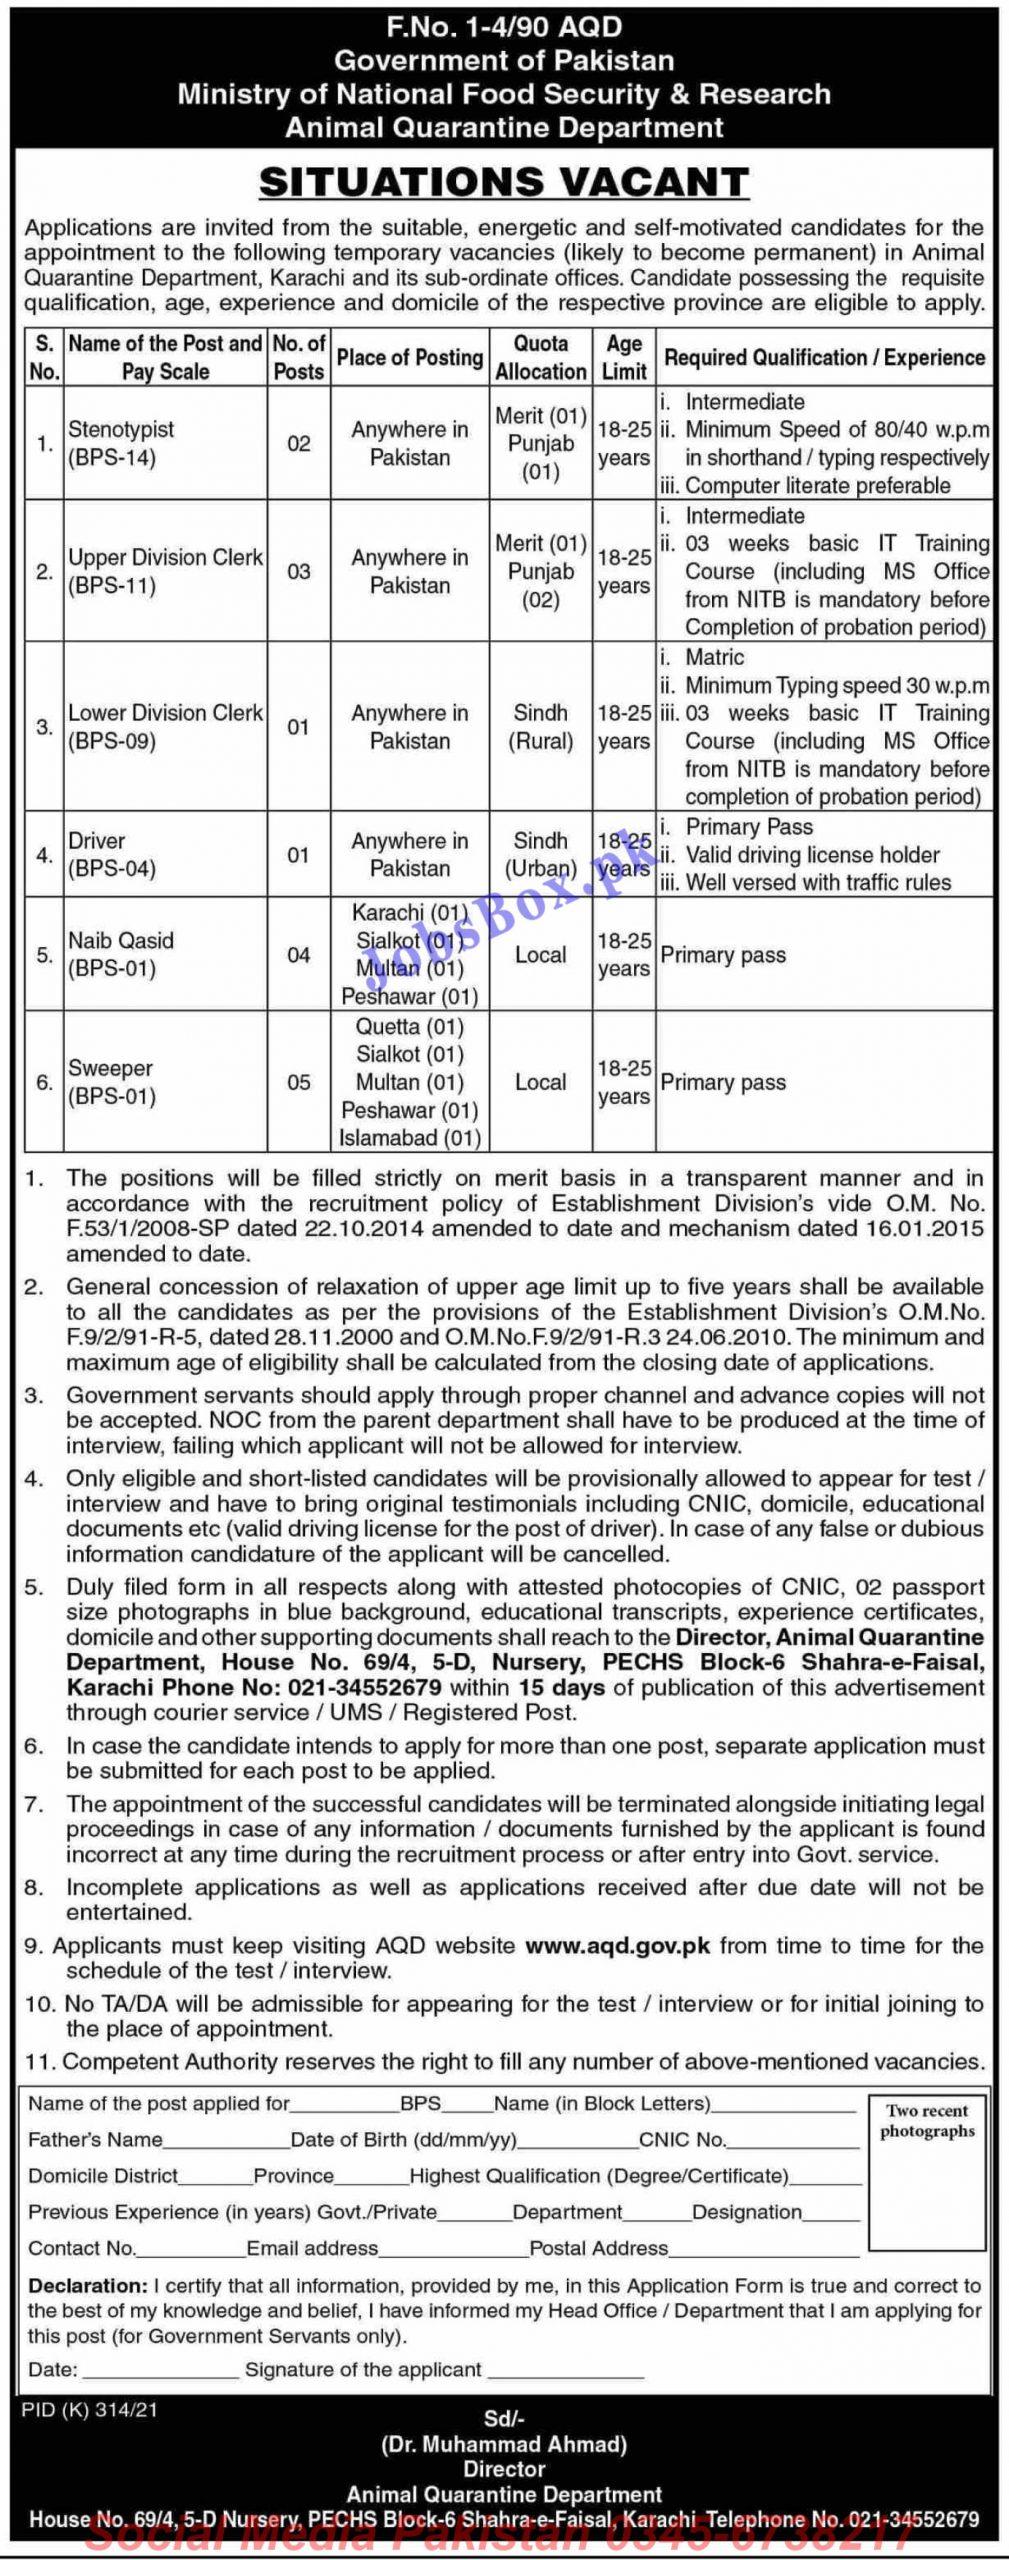 Animal Quarantine Department AQD Karachi Jobs 2021 – Application Form